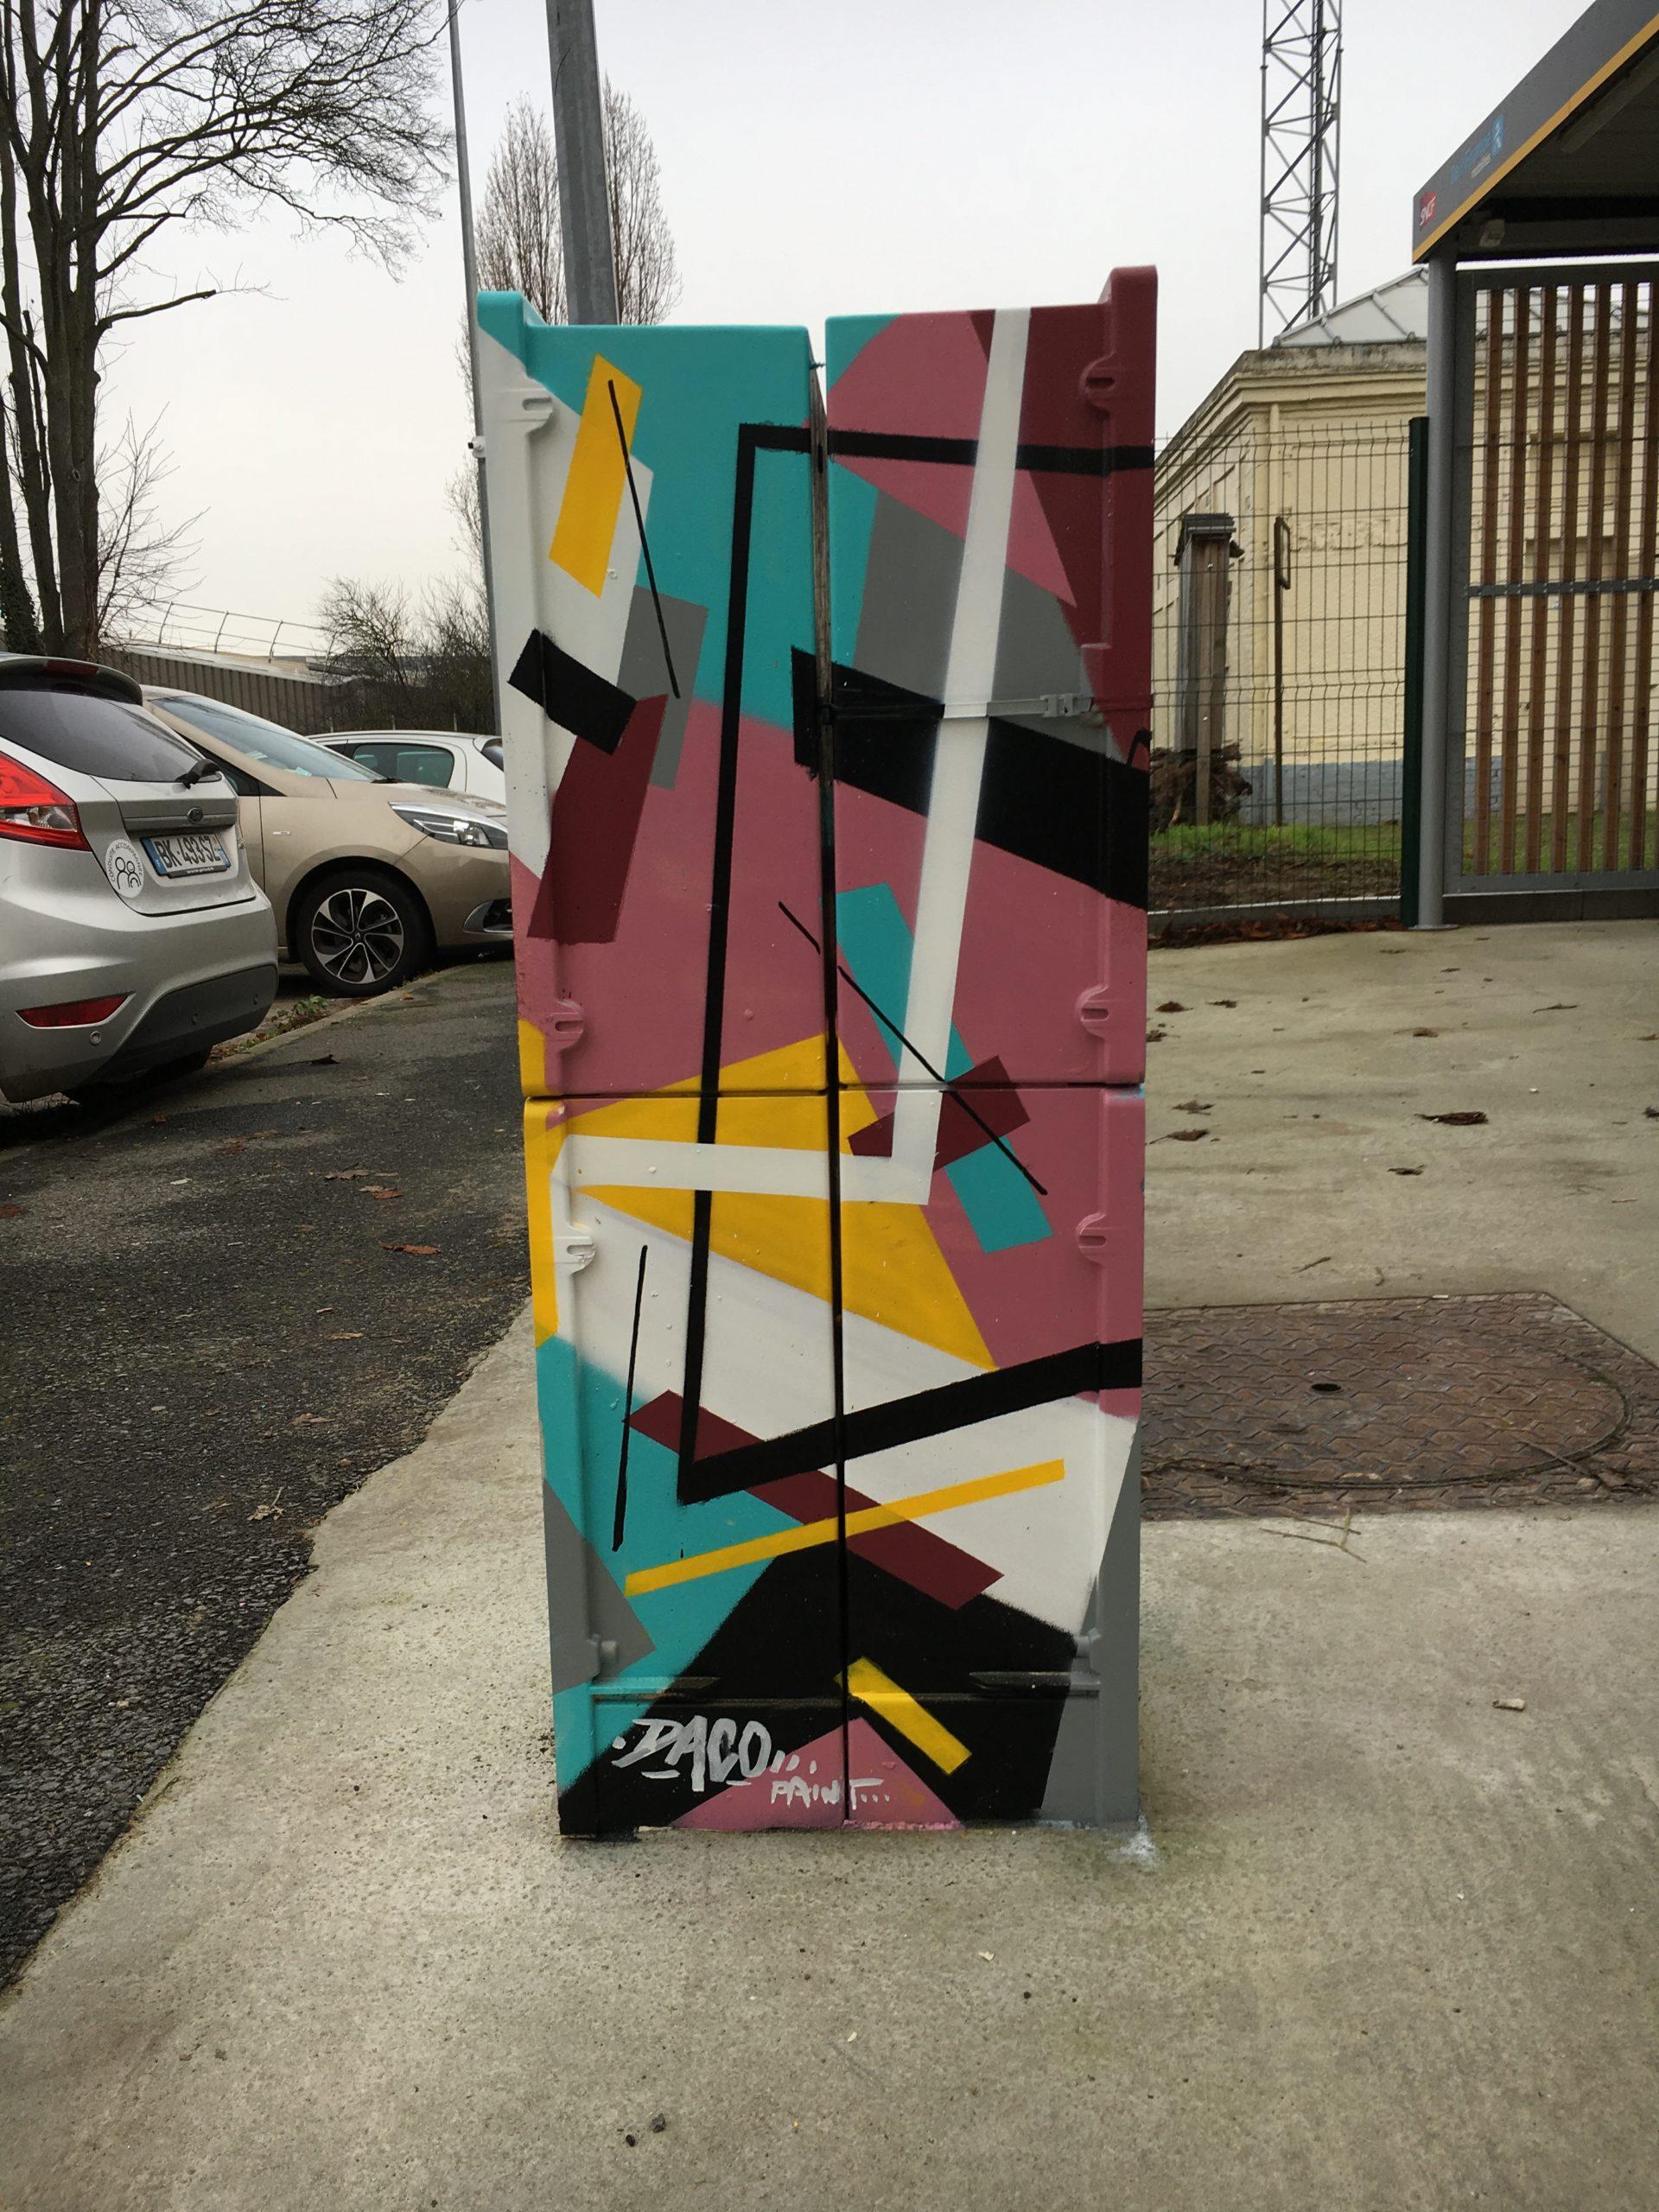 Fresque Graffaune Graffiti construction abstraite réalisée par Daco